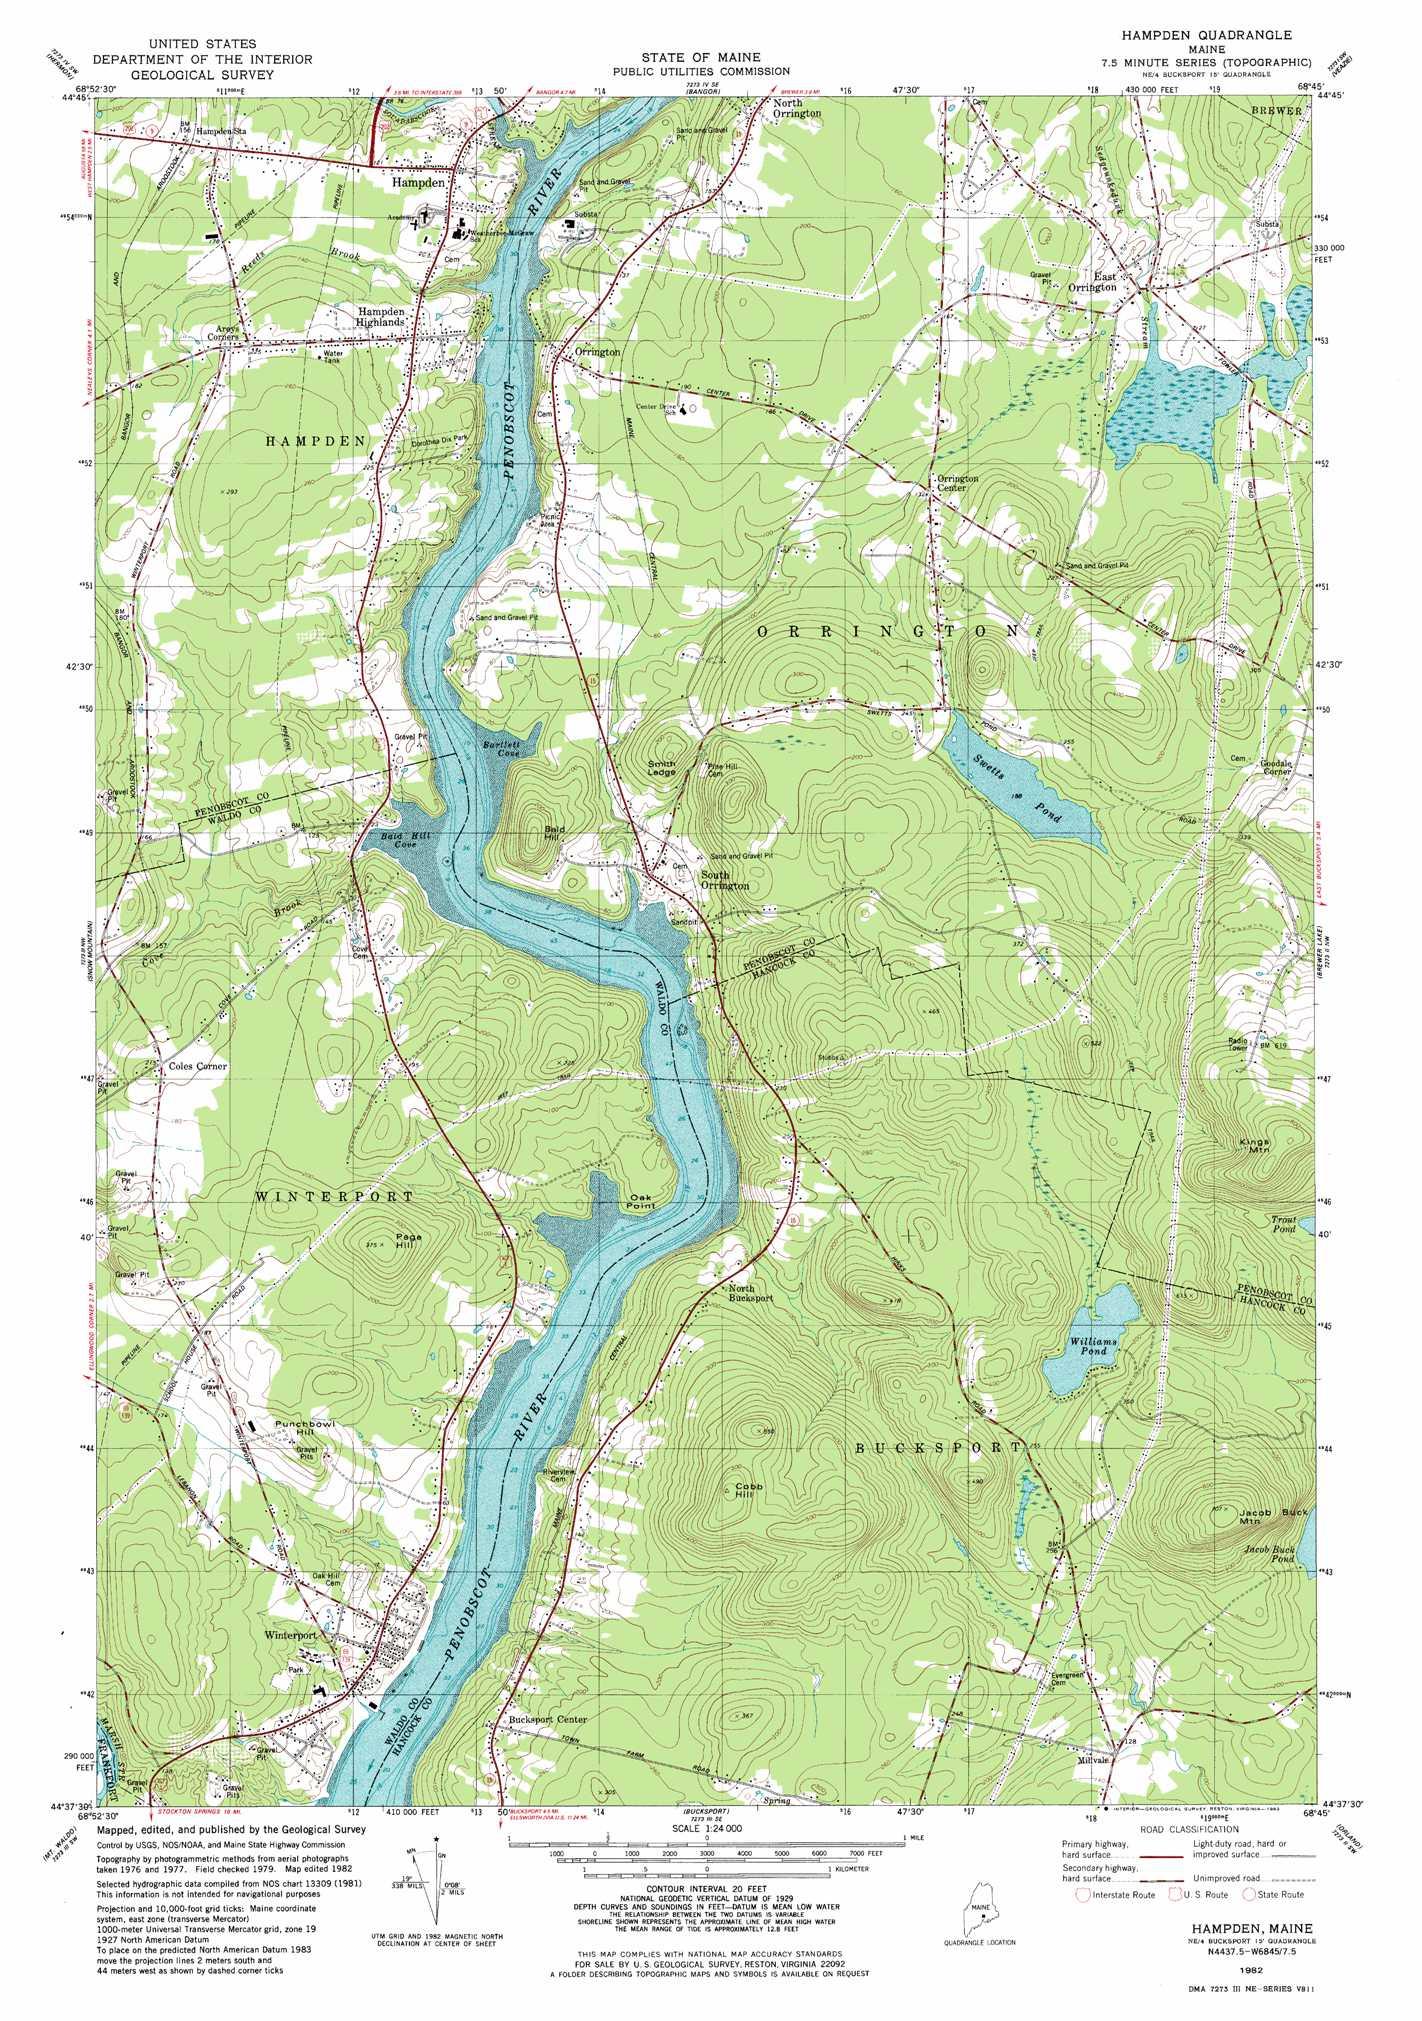 Hampden Topographic Map ME  USGS Topo Quad 44068f7